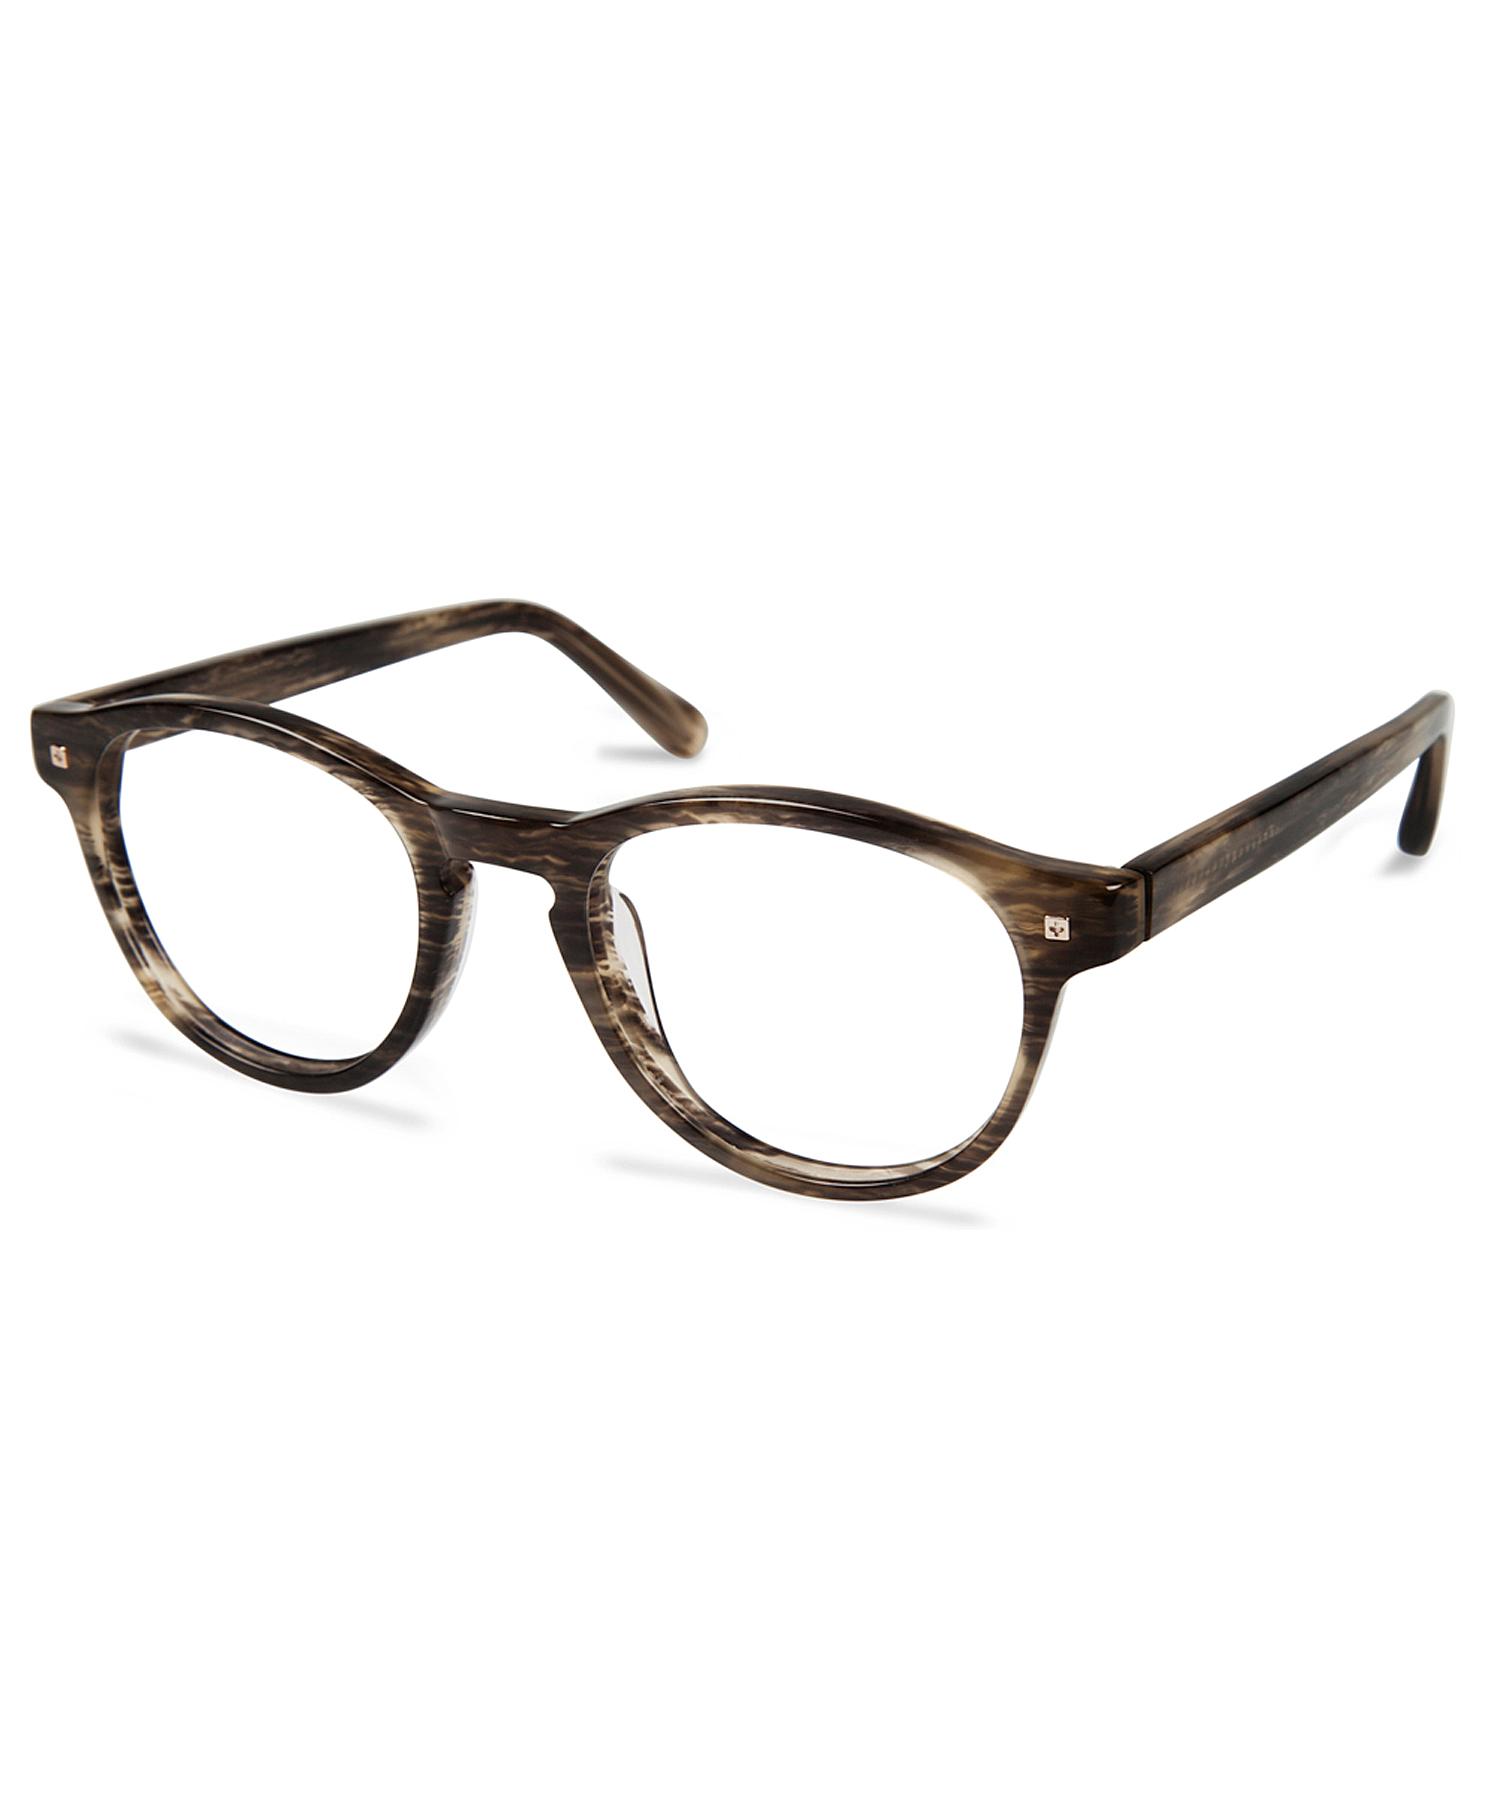 Green Eyeglass Frames Plastic : Cynthia rowley Green Horn Round Plastic Eyeglasses in ...